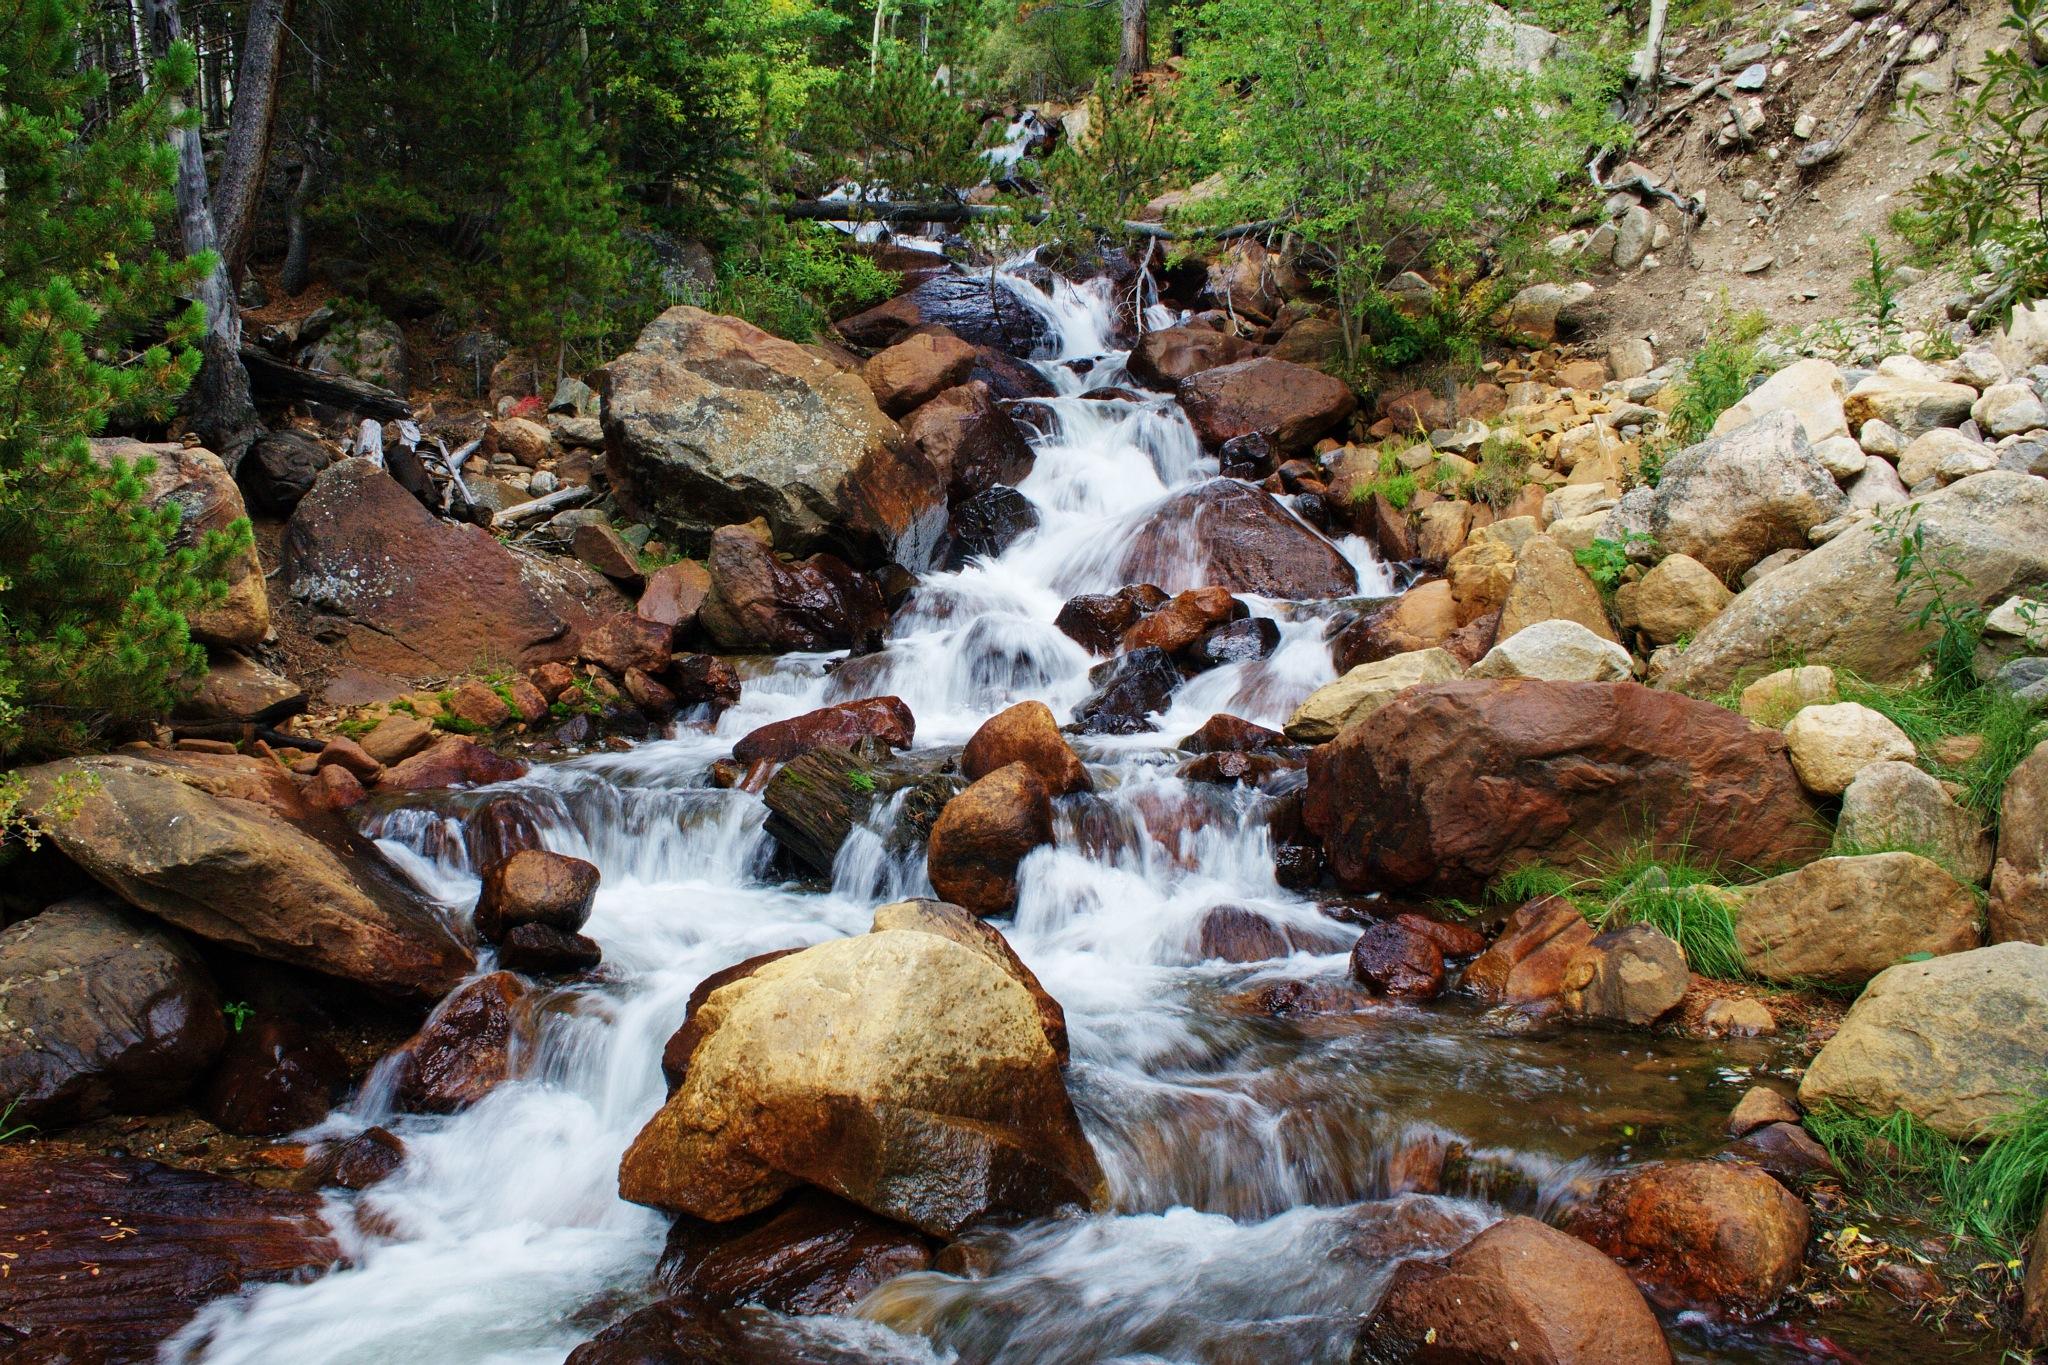 Cascading Waterfall 2 by daniel.luna.77920